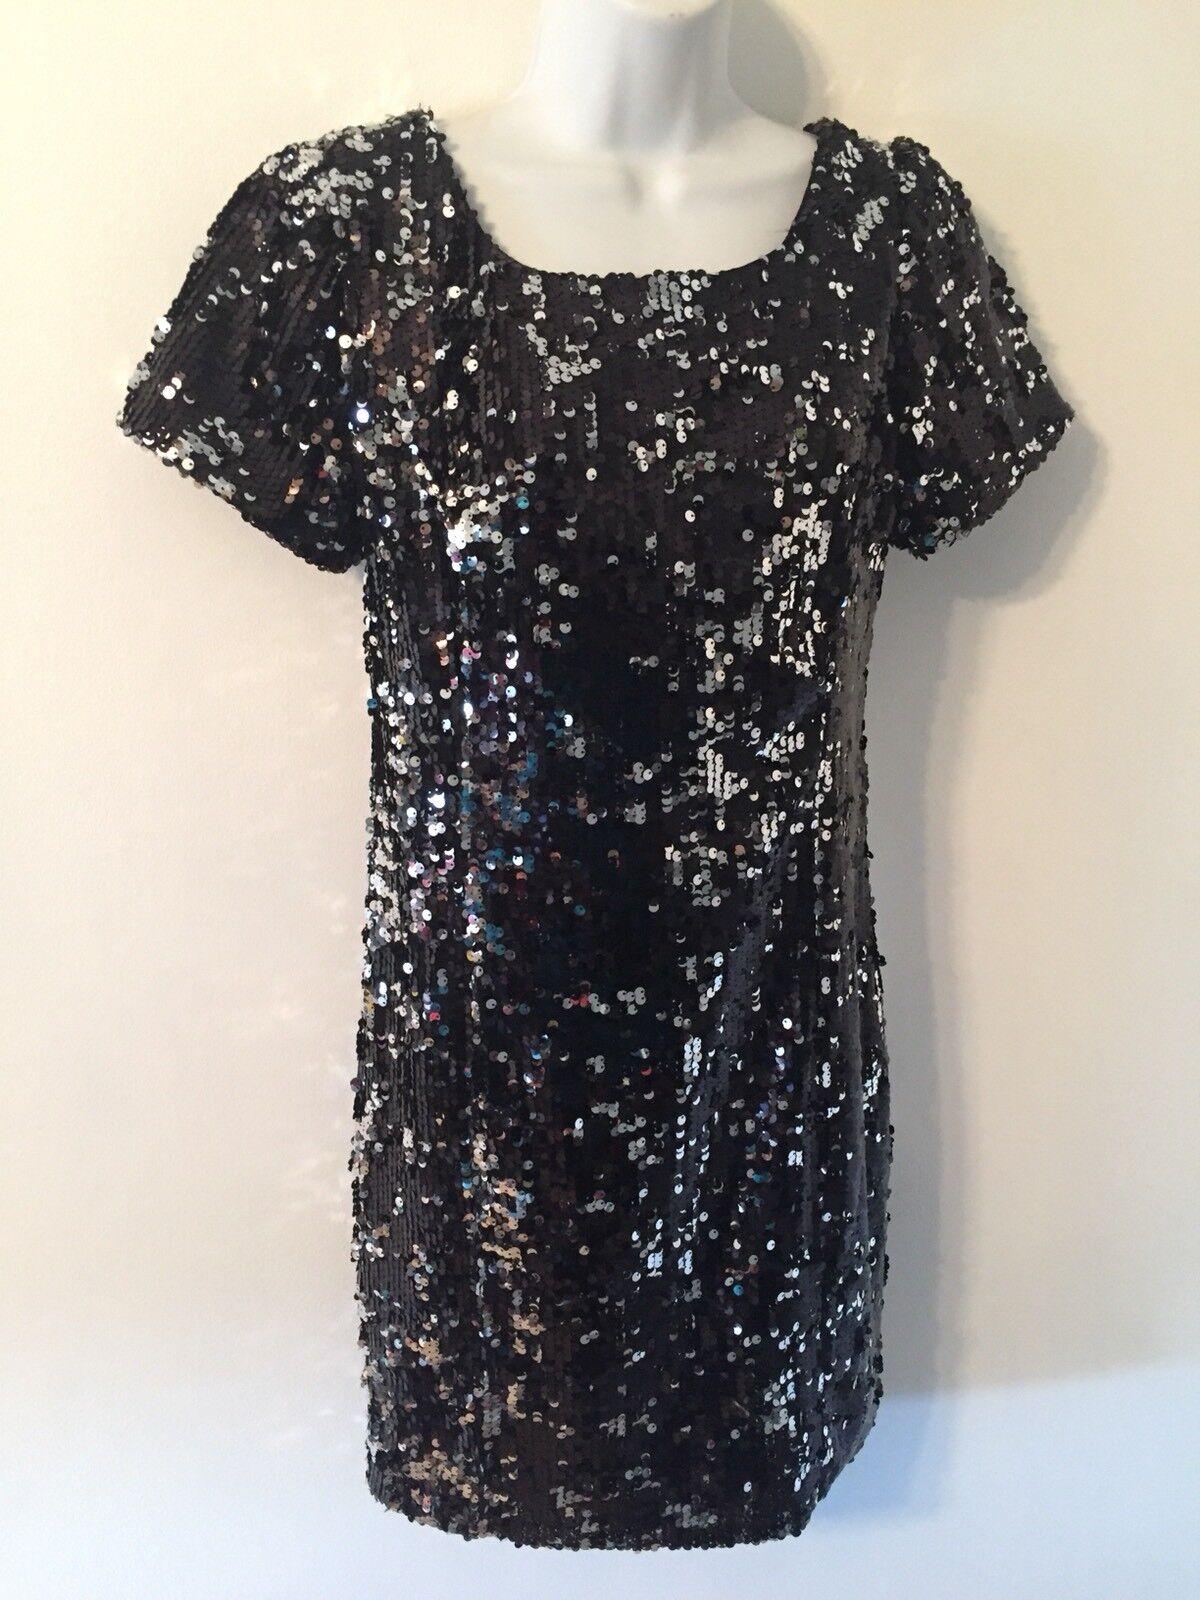 Milly of New York schwarz Formal or Cocktail Dress Sequined Größe Medium J10